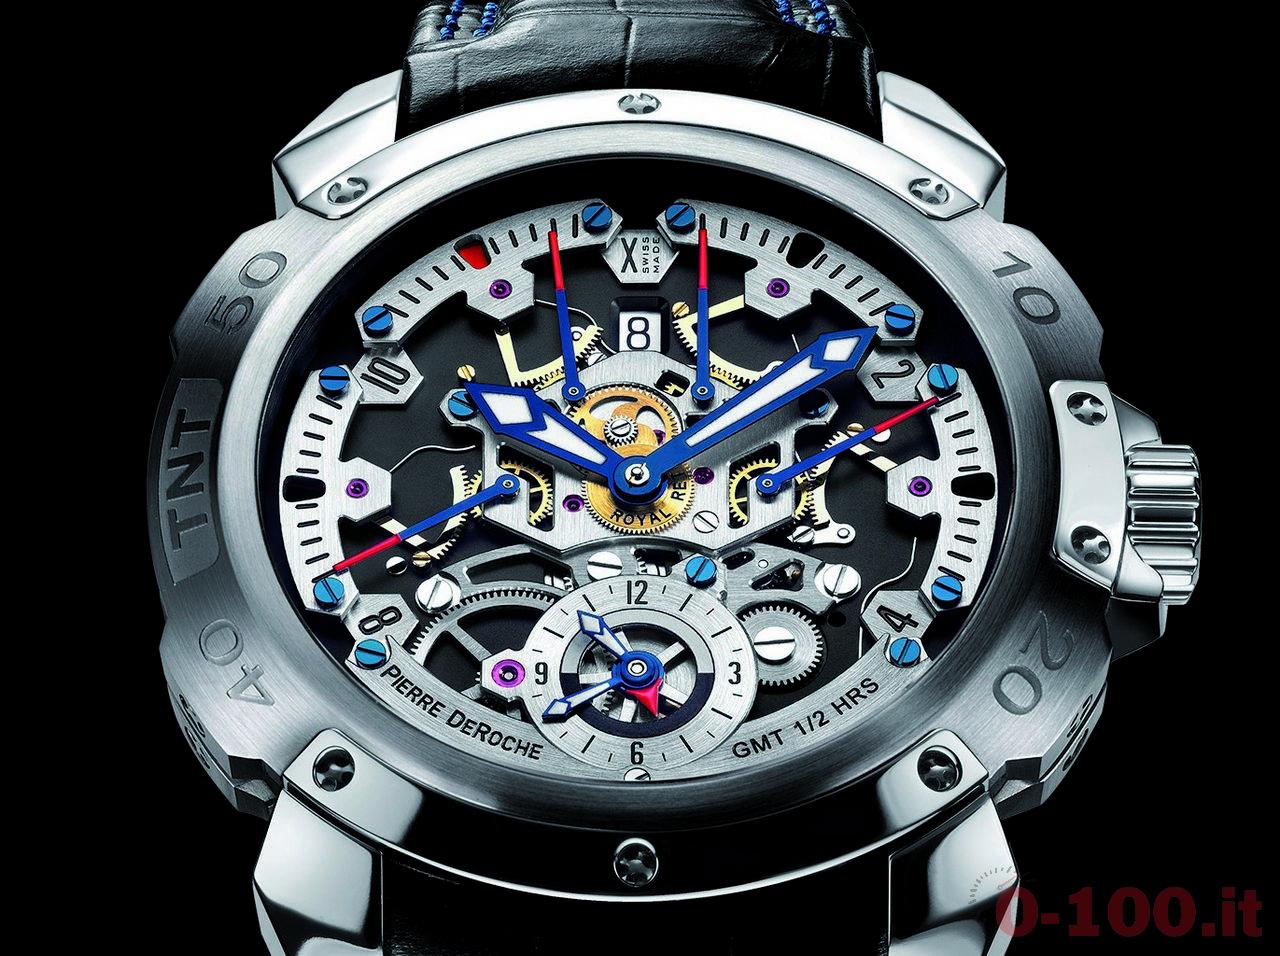 anteprima-baselworld-2015-pierre-deroche-tnt-royal-retro-gmt-½-hour-limited-edition_0-100_2